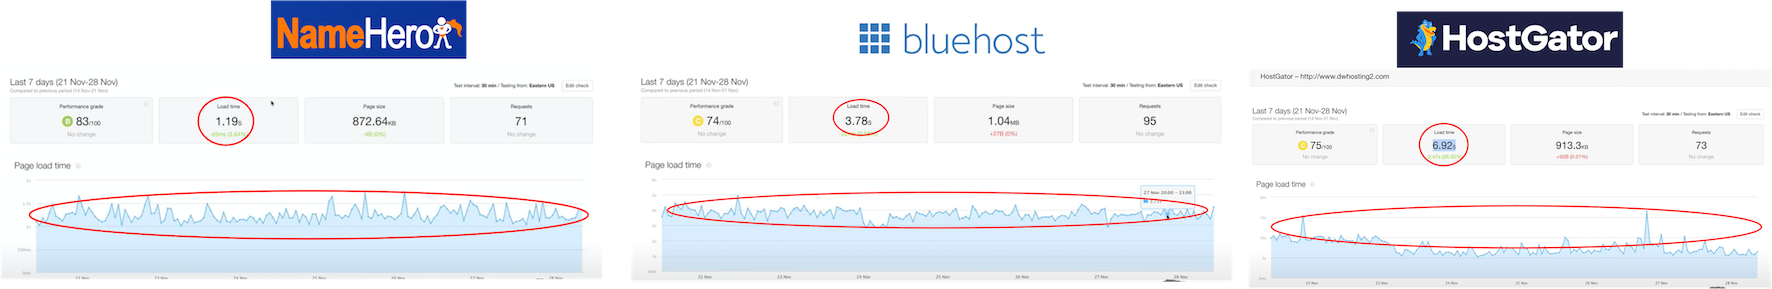 Namehero speed review versus Bluehost and Hostgator